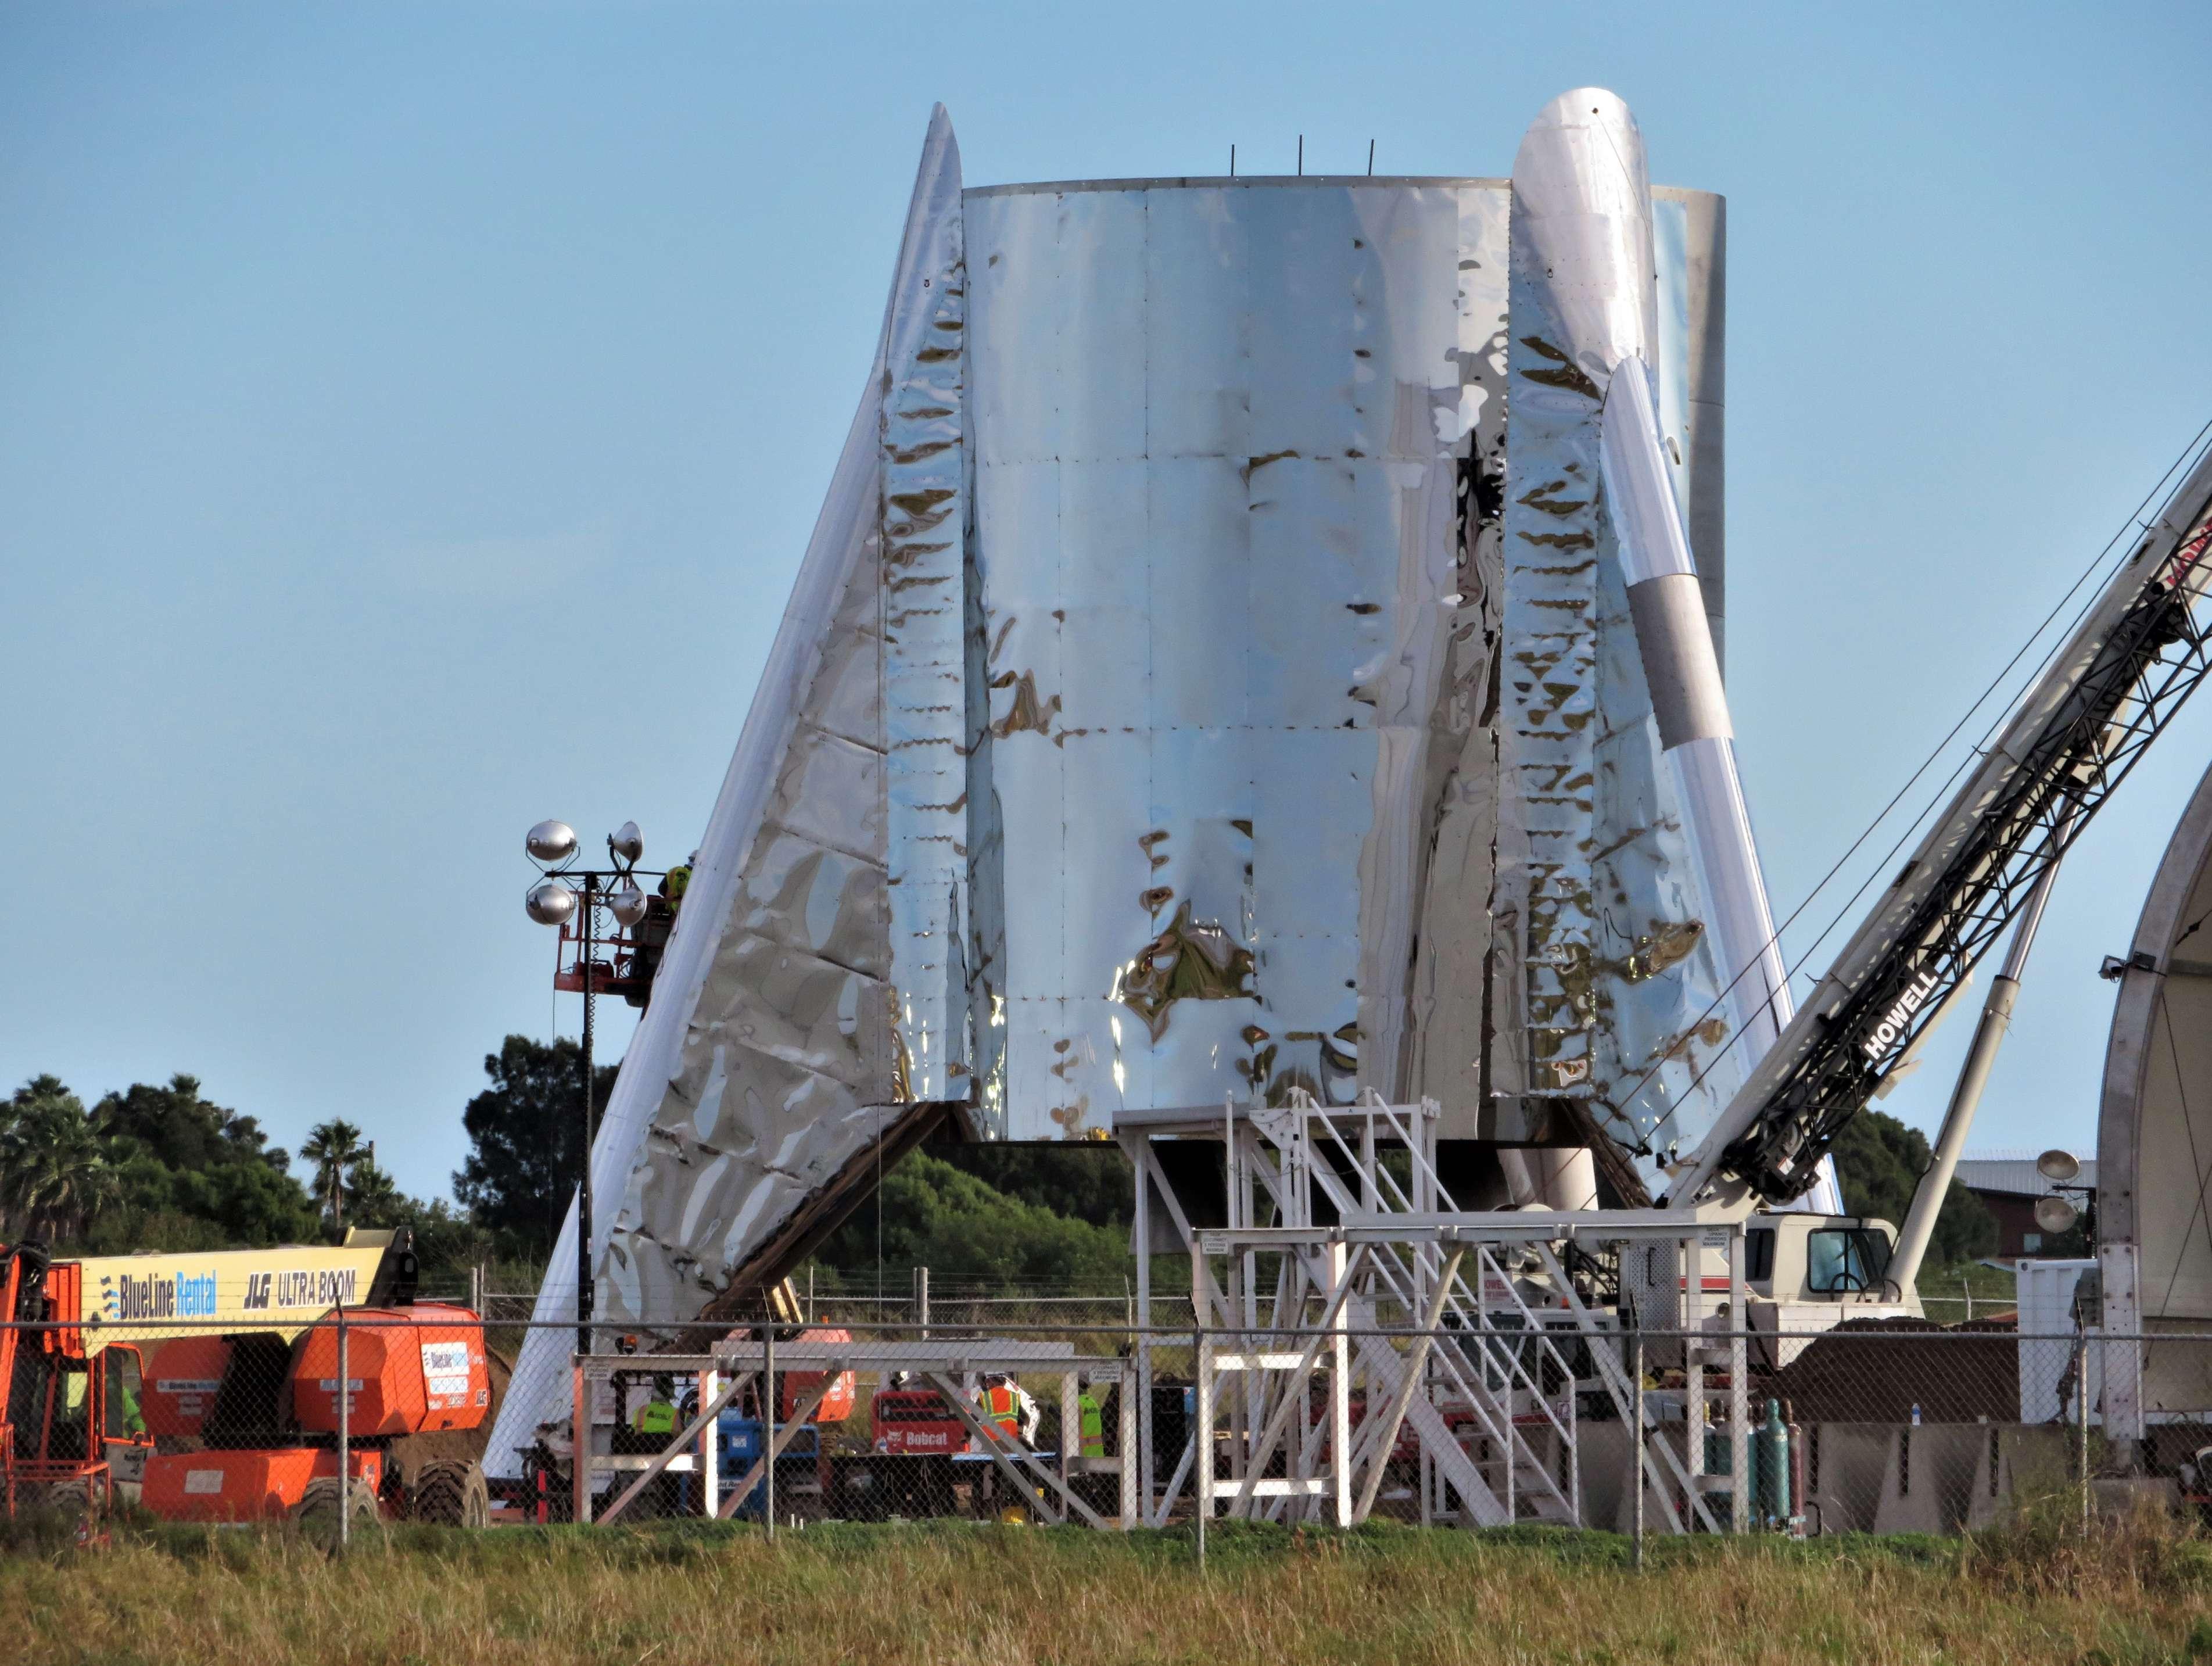 Boca Chica Starship Alpha progress 010618 (NSF – bocachicagal) 2(c)